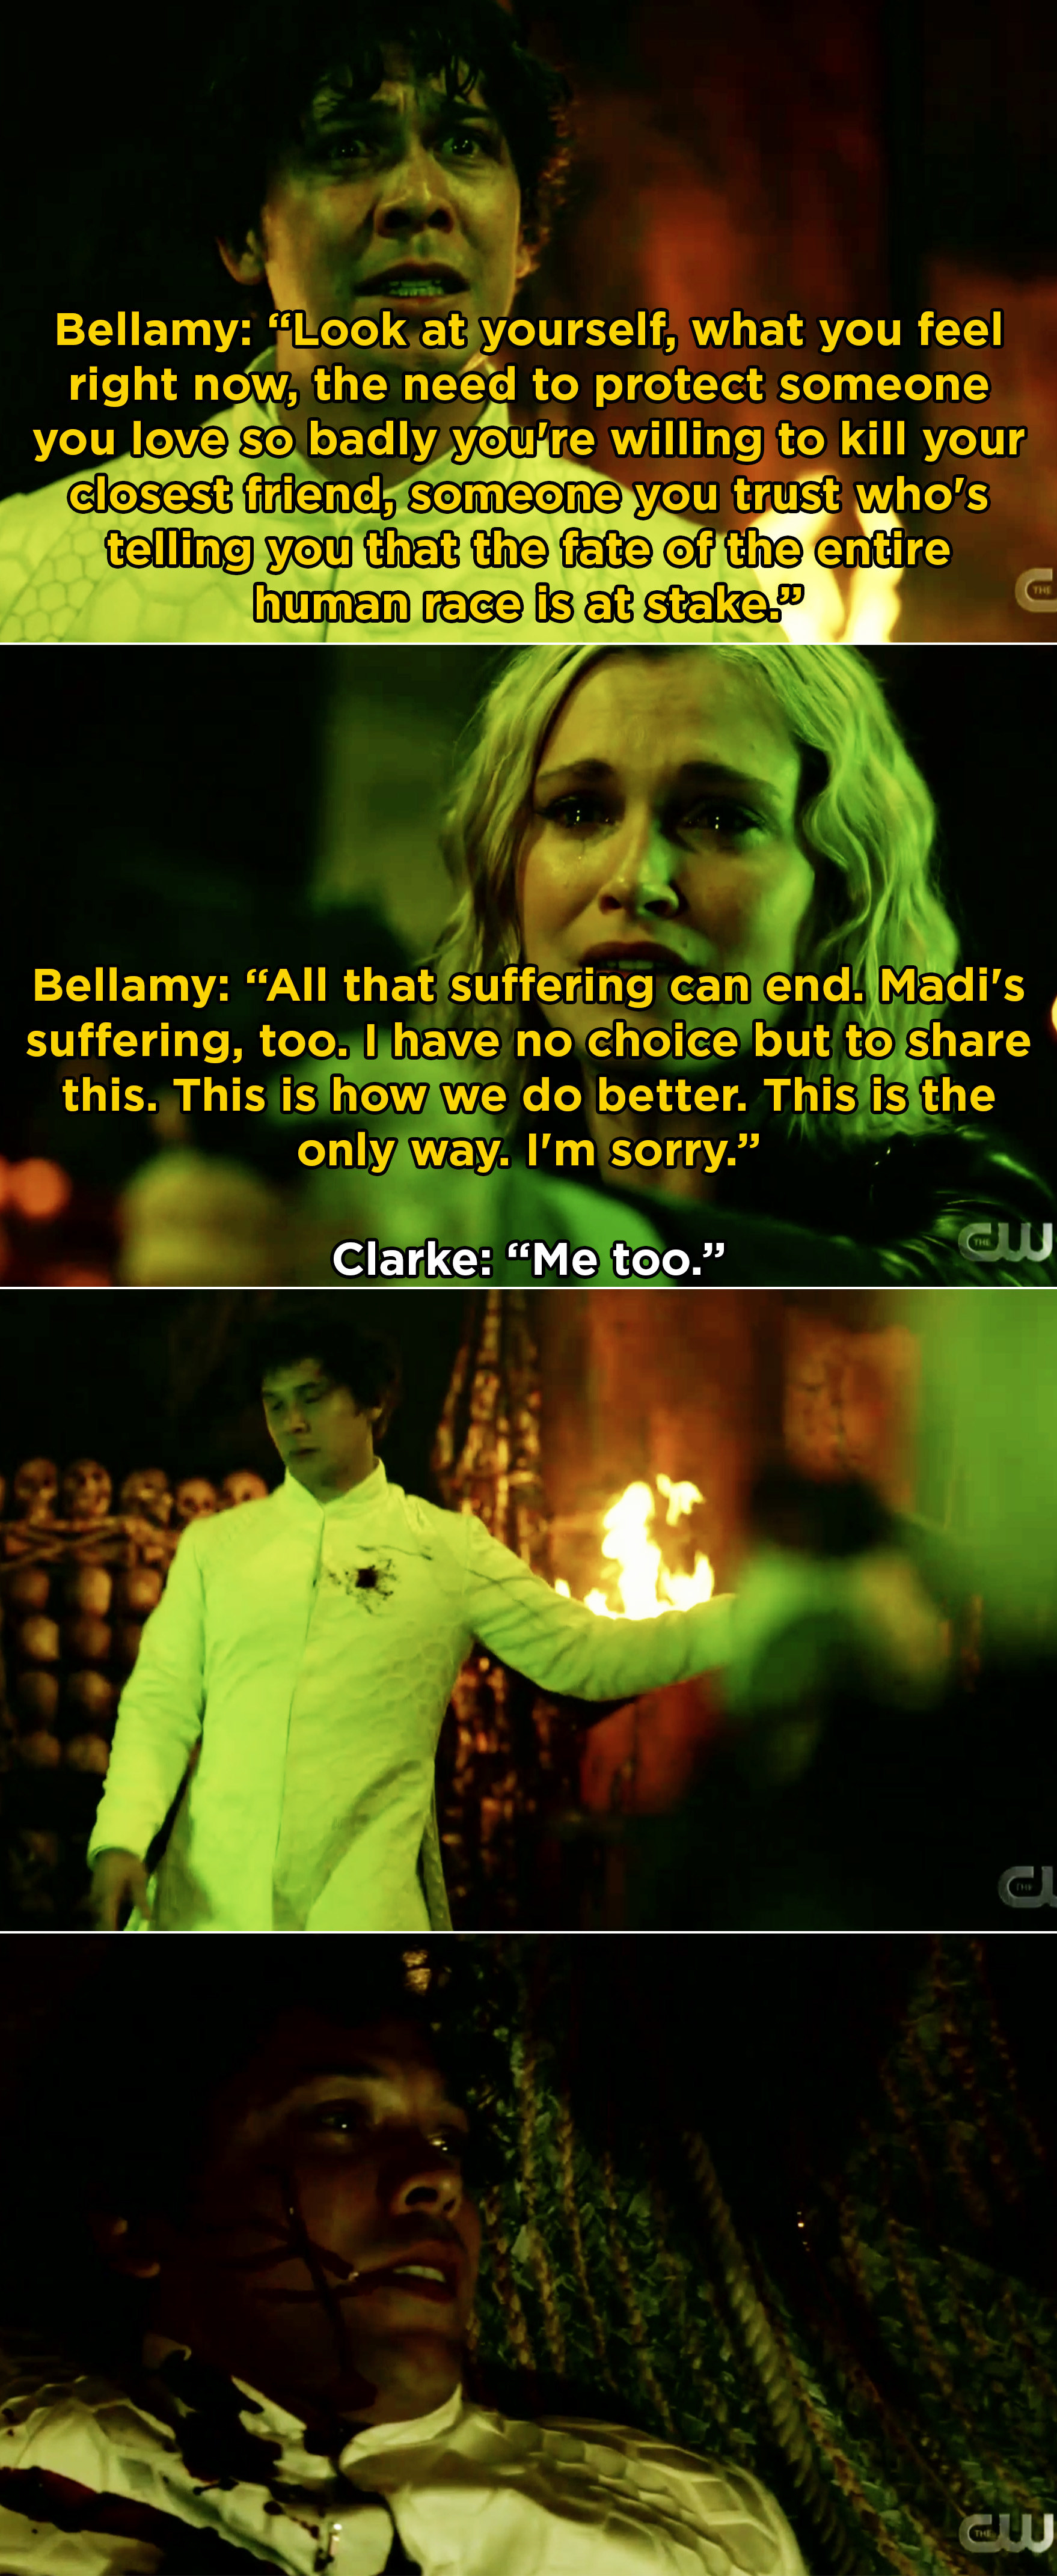 Clarke shooting and killing Bellamy